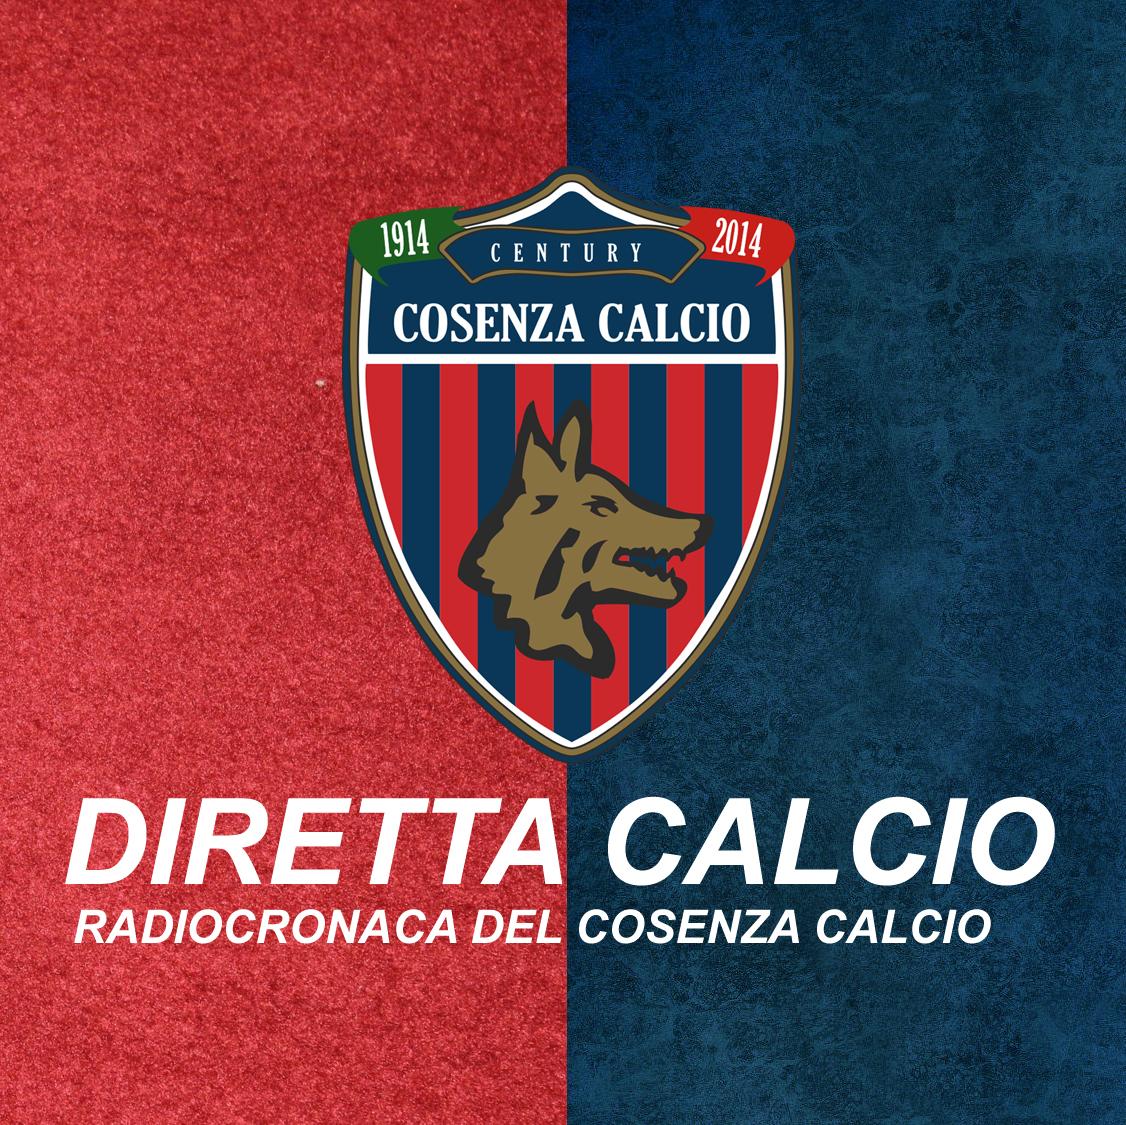 Diretta Calcio Jonica Radio